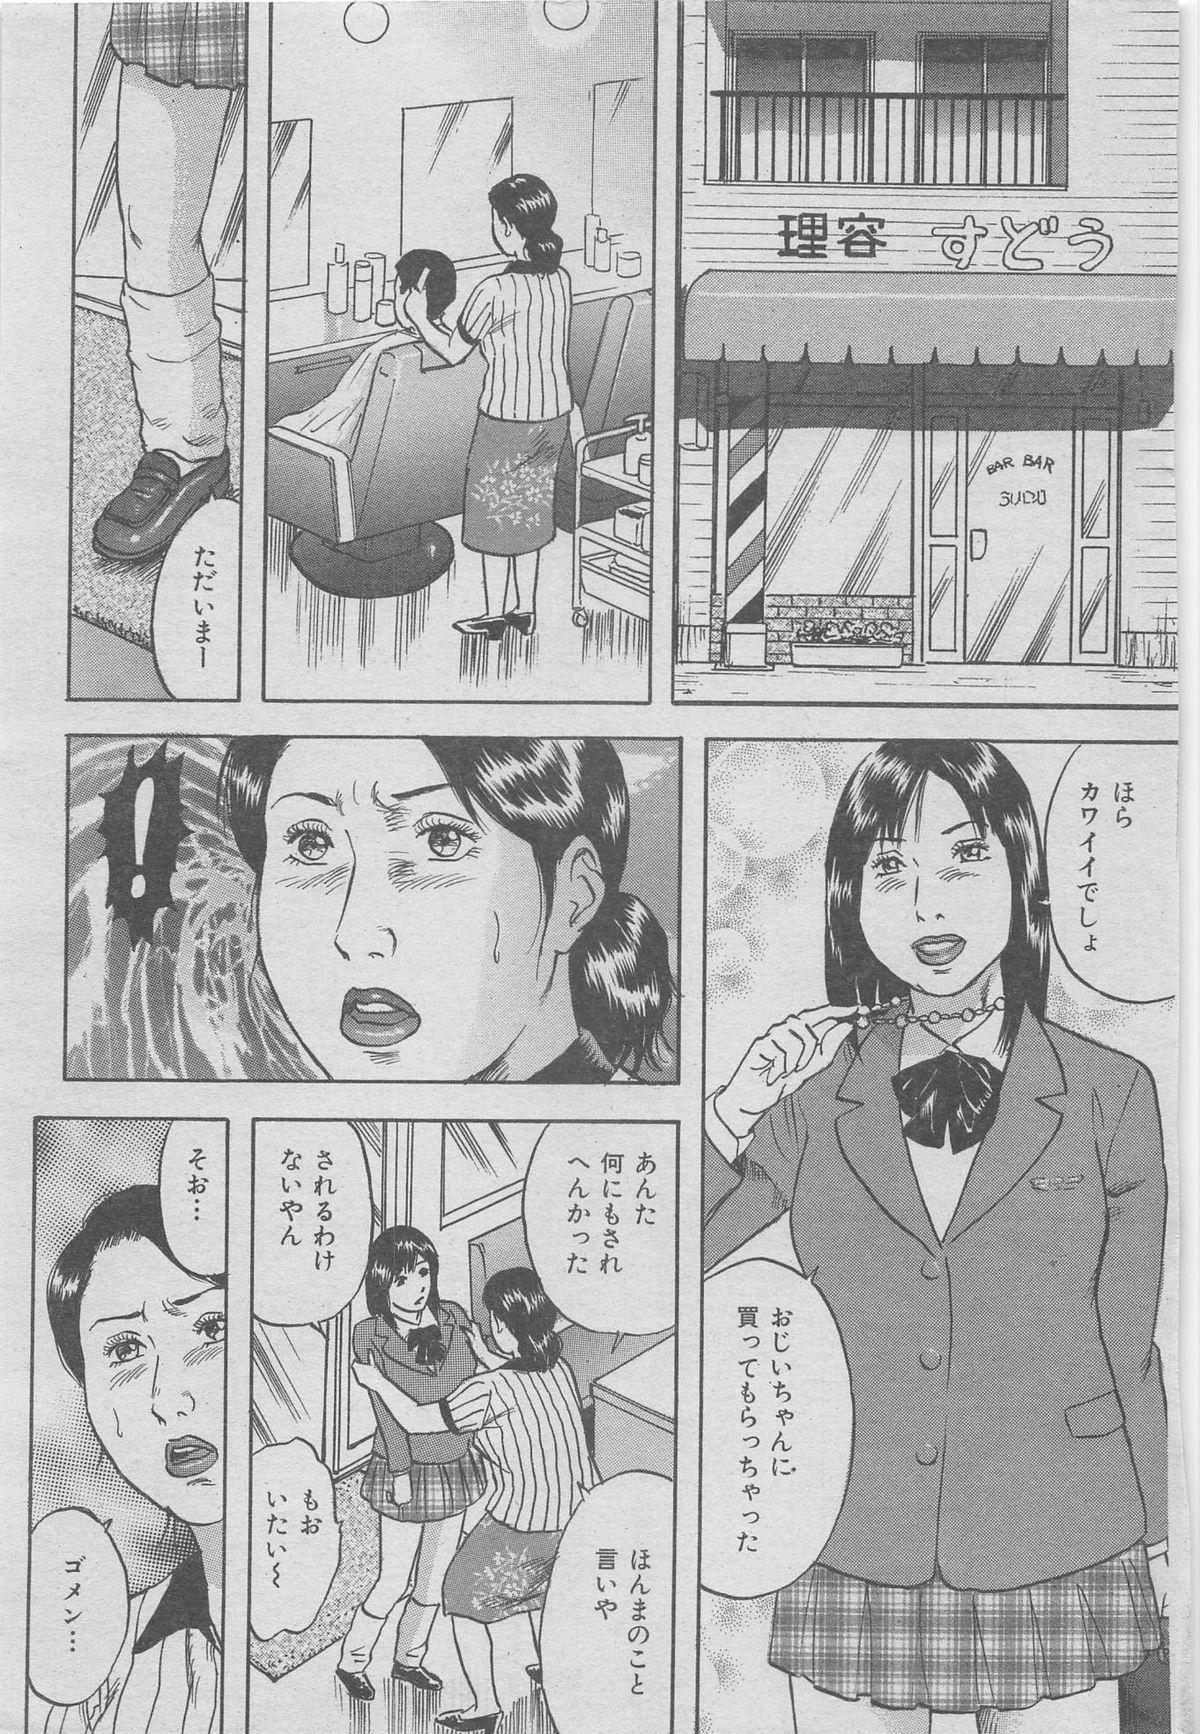 Hontou ni Atta Kindanai vol.7 126